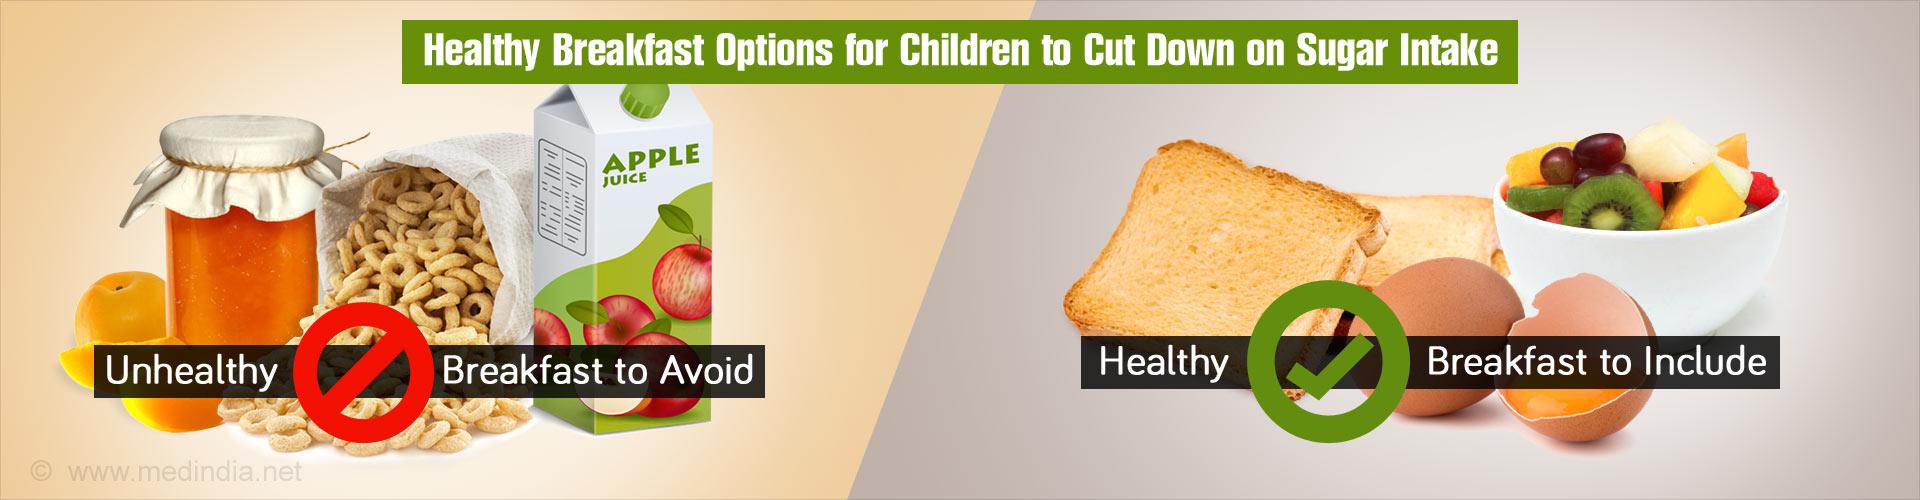 Be Food Smart App Help Parents Choose Healthy Foods for Kids